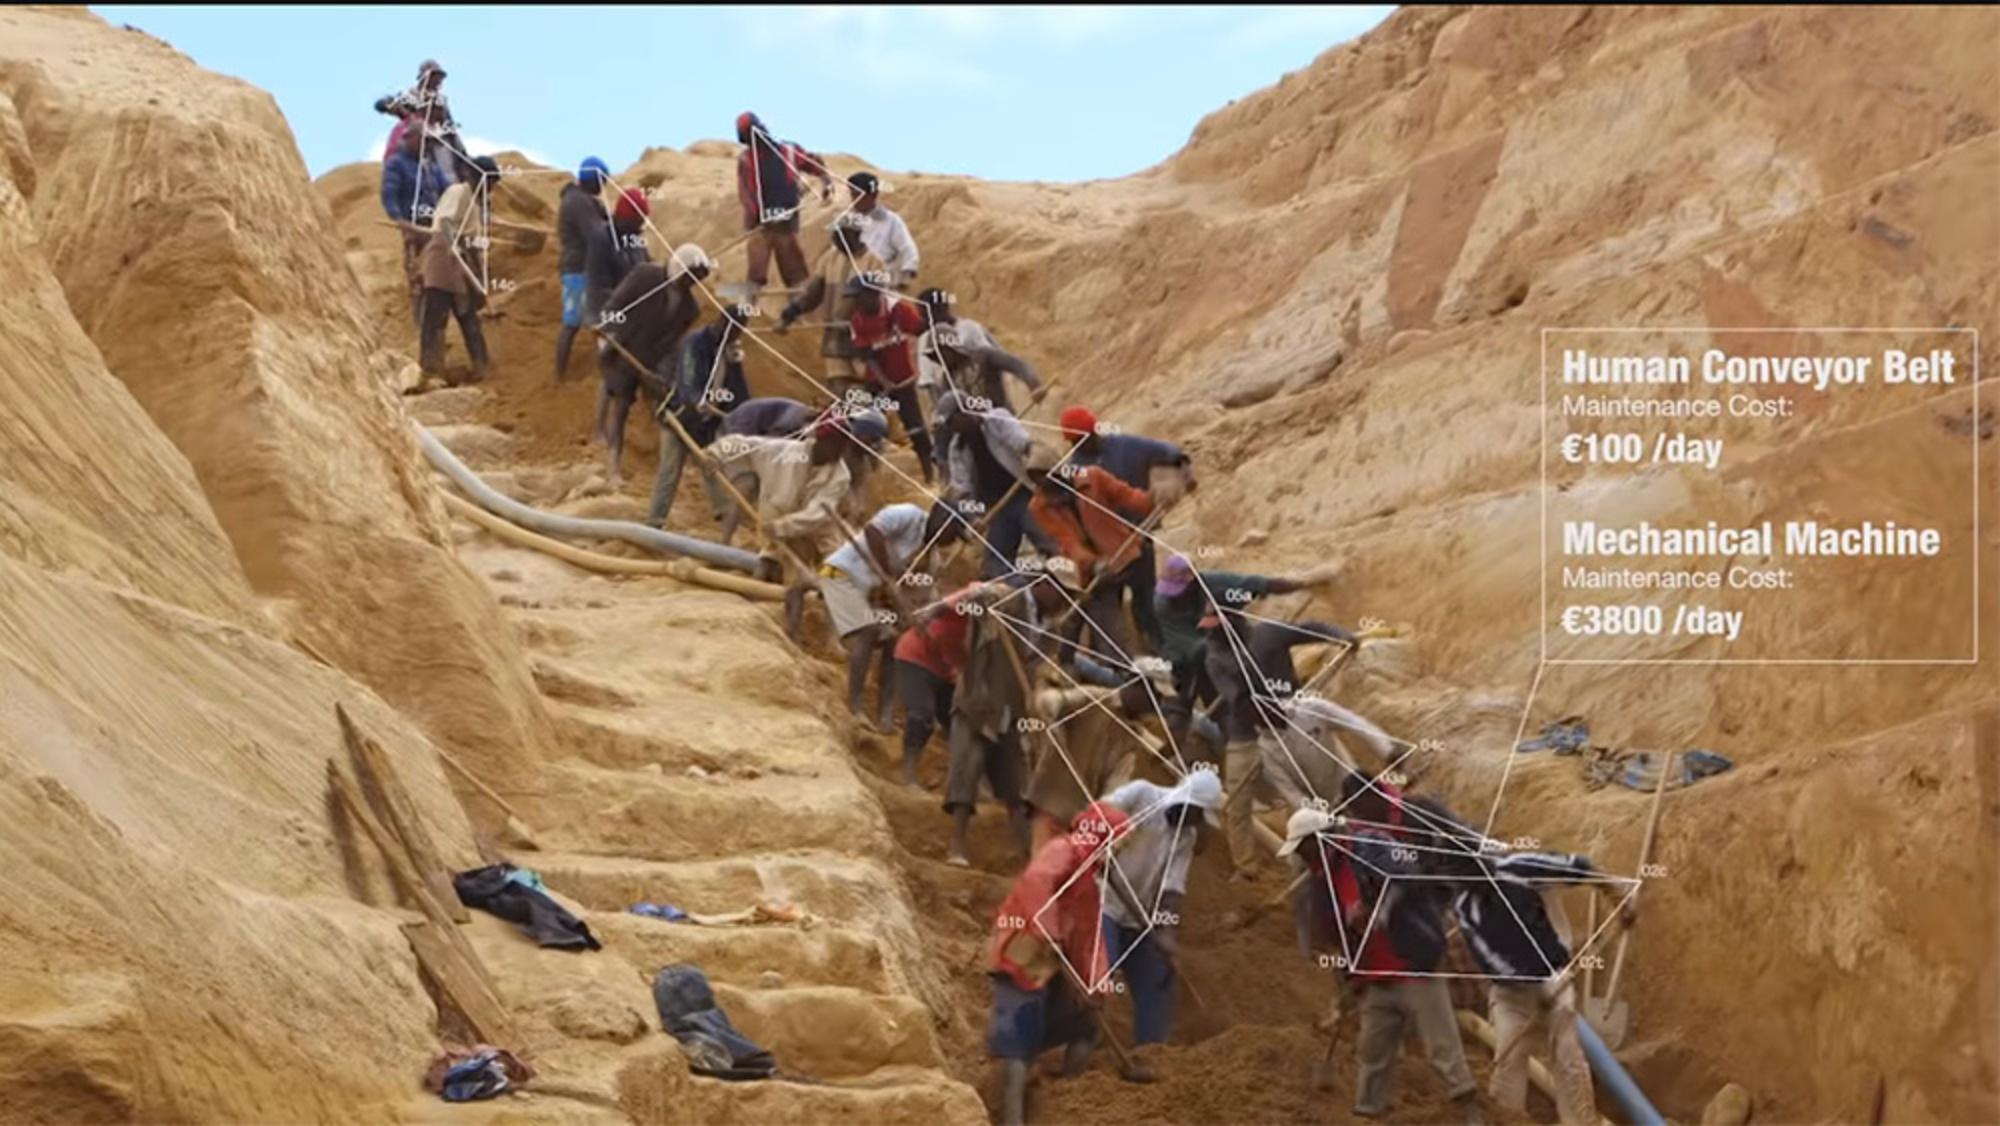 What economics look like in resource-rich yet poverty-stricken Madagascar   Aeon Videos